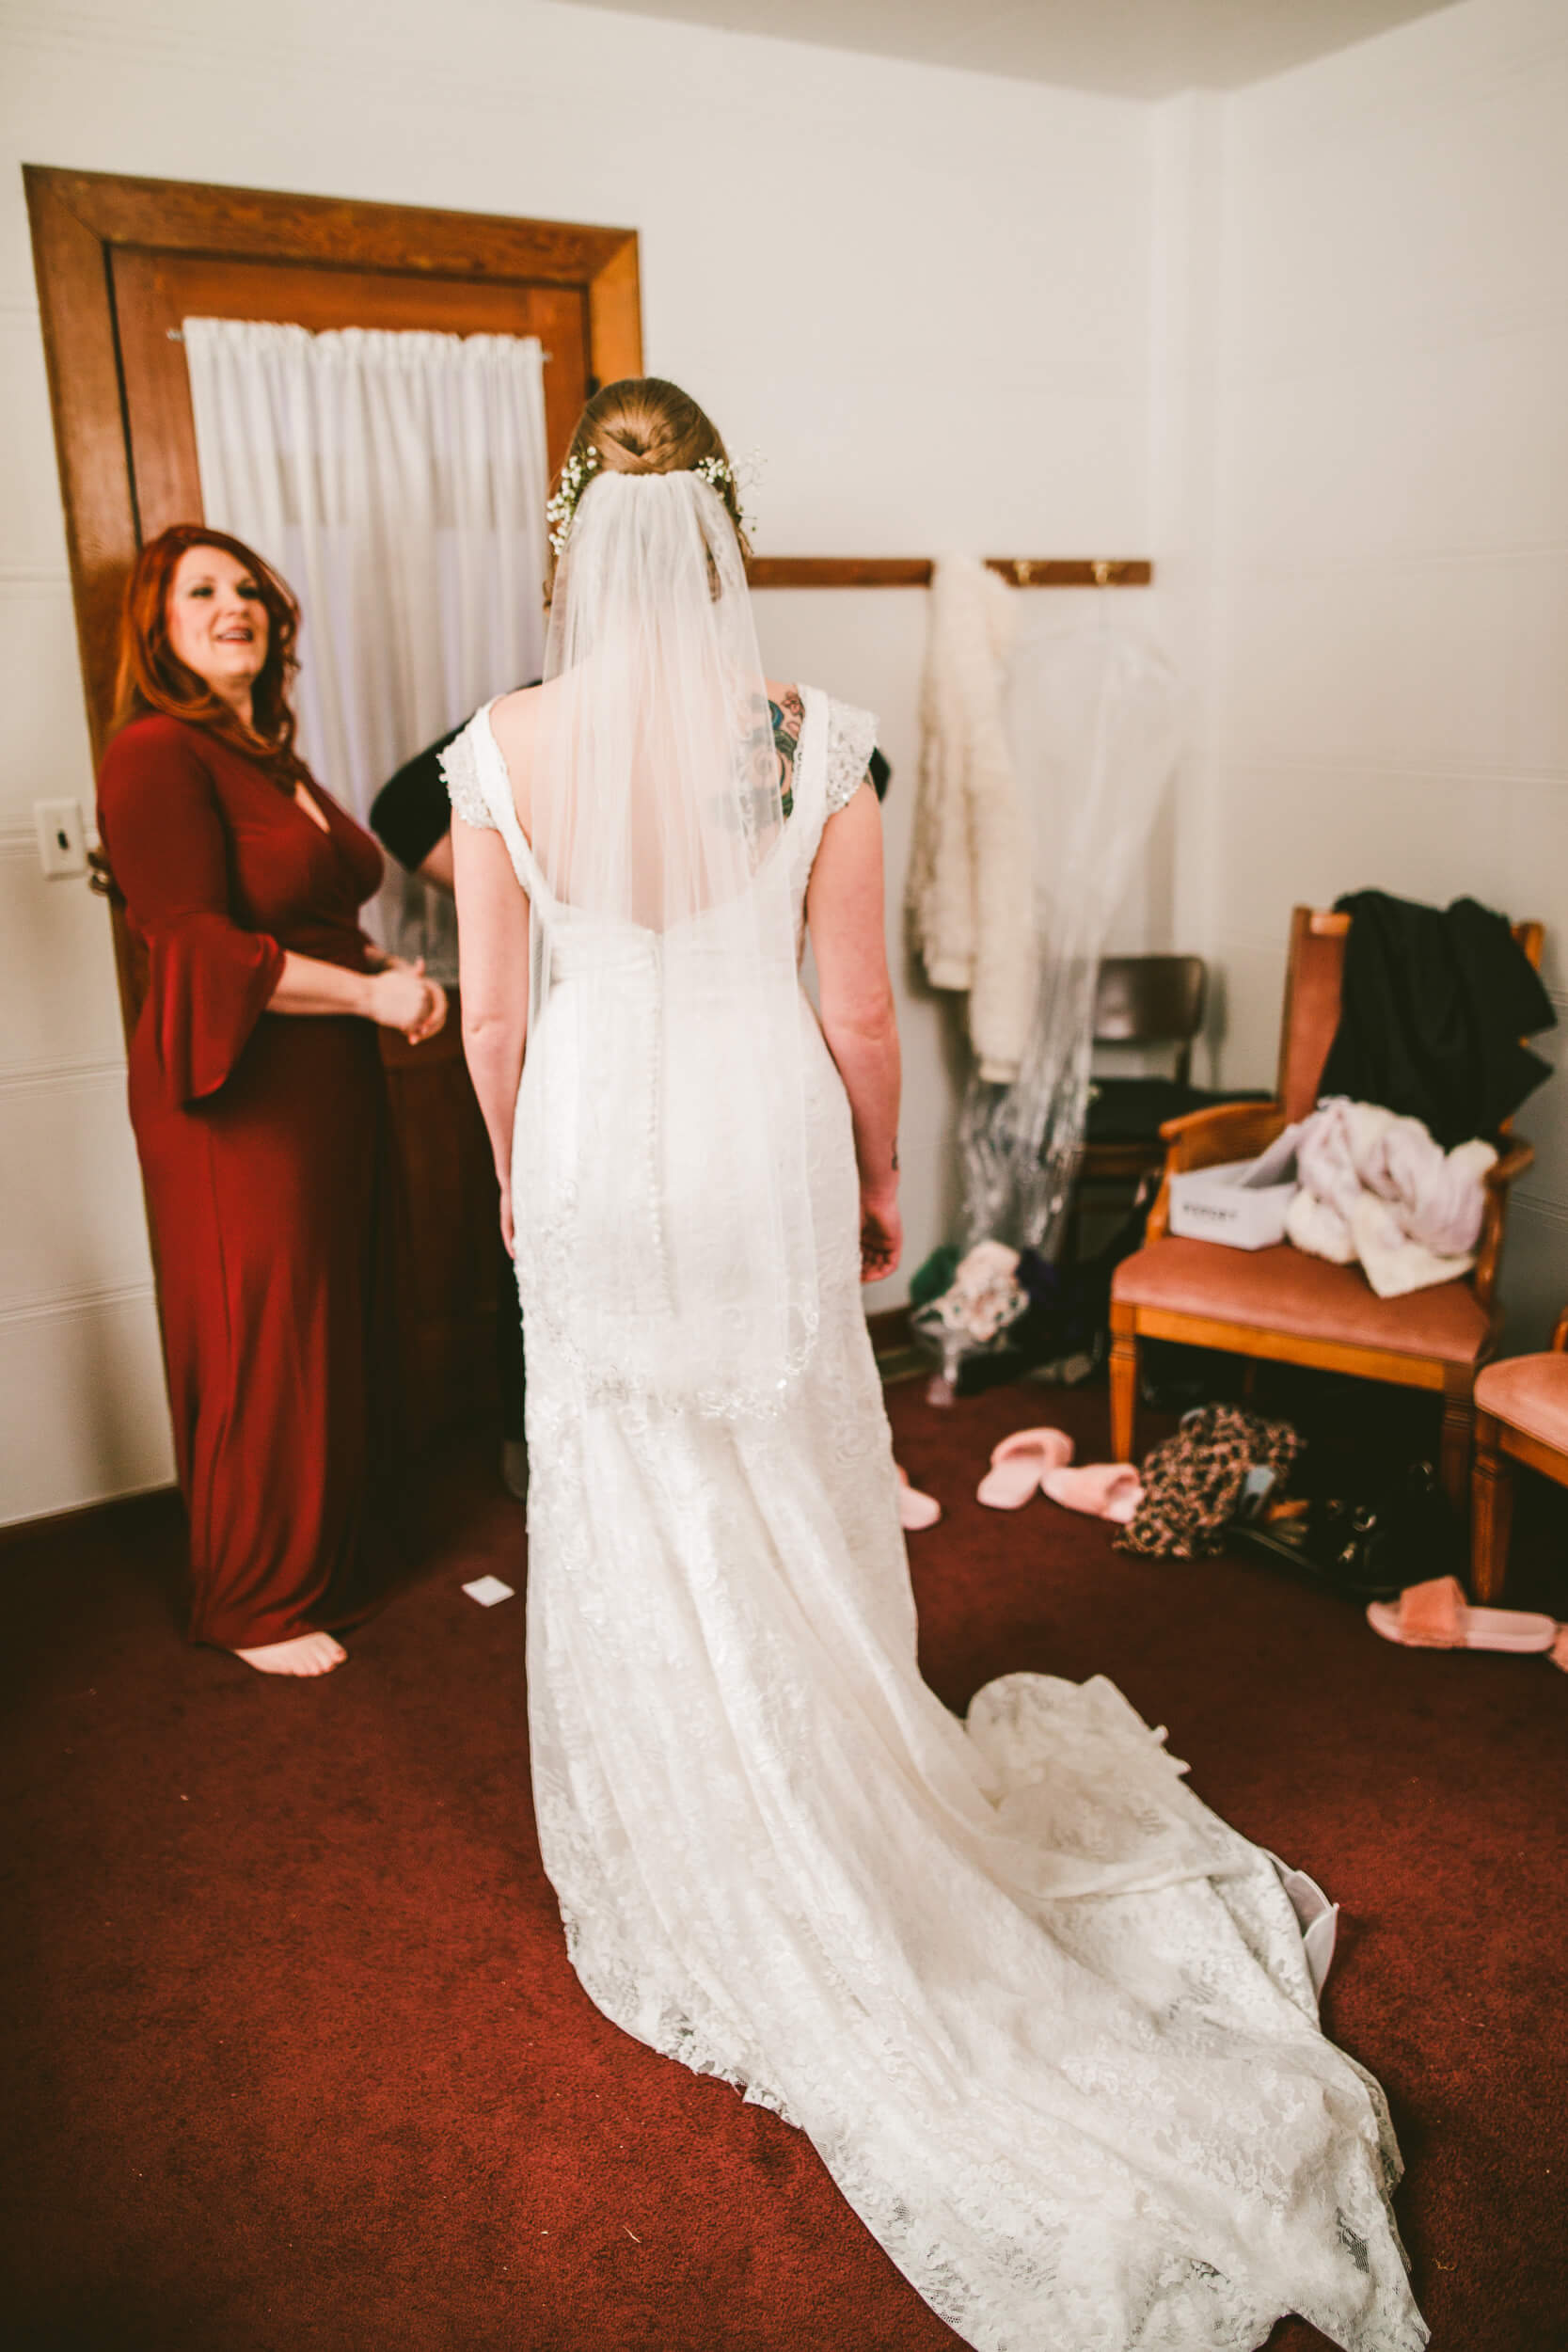 mukogawa winter wedding in spokane (46).jpg